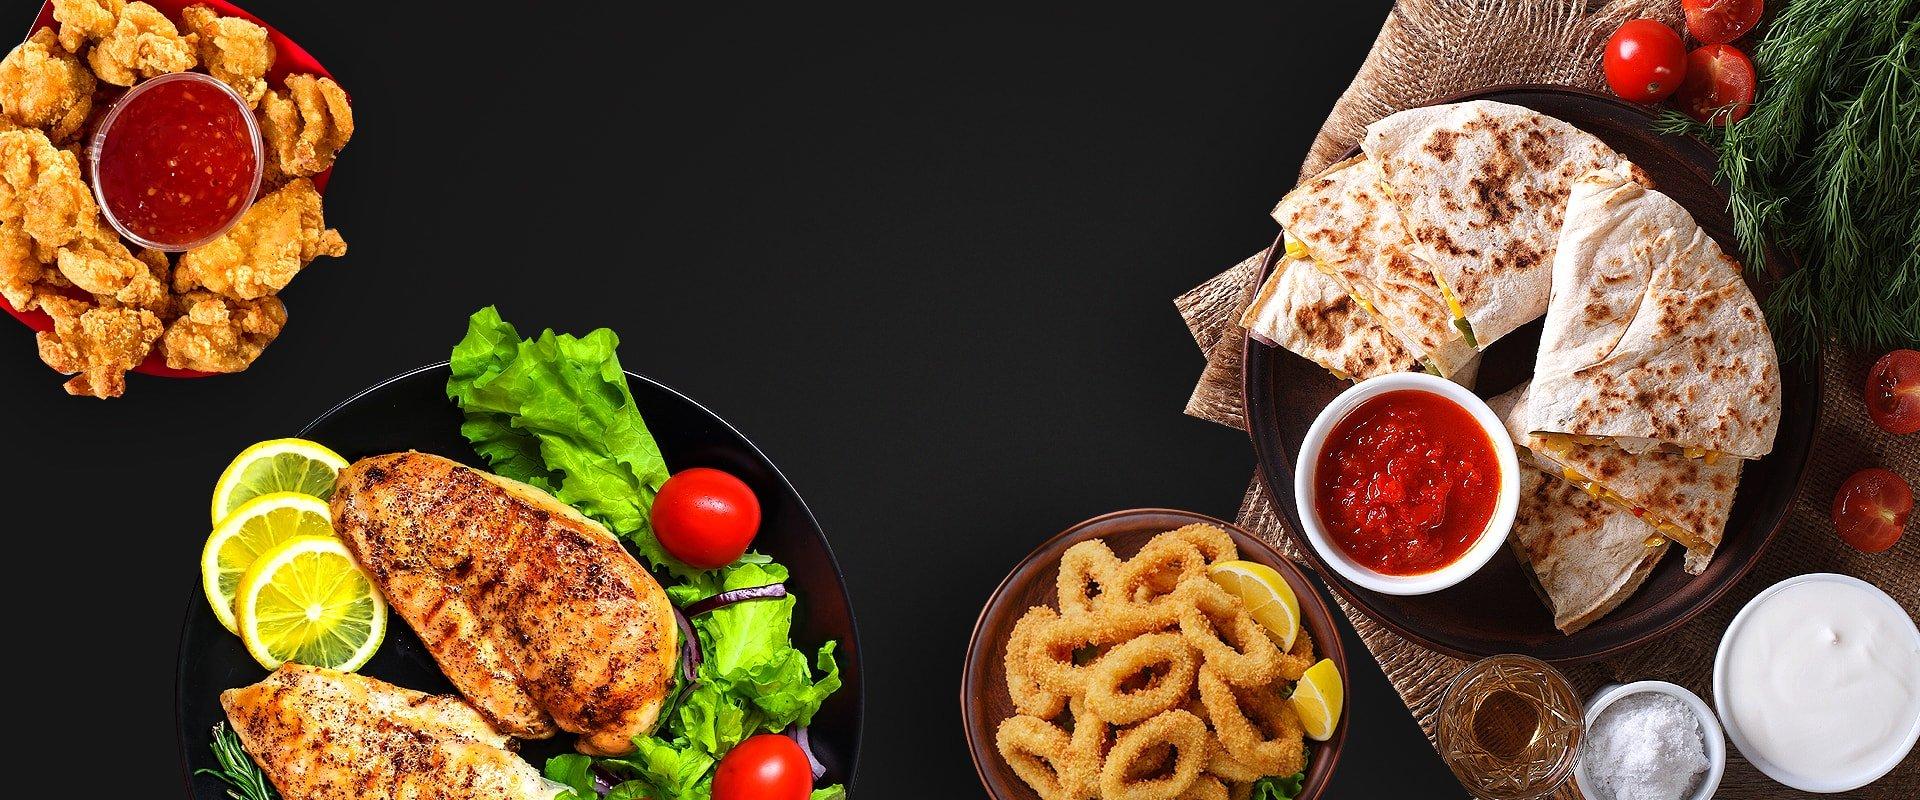 Starter food items by A Tavola Bar & Grill